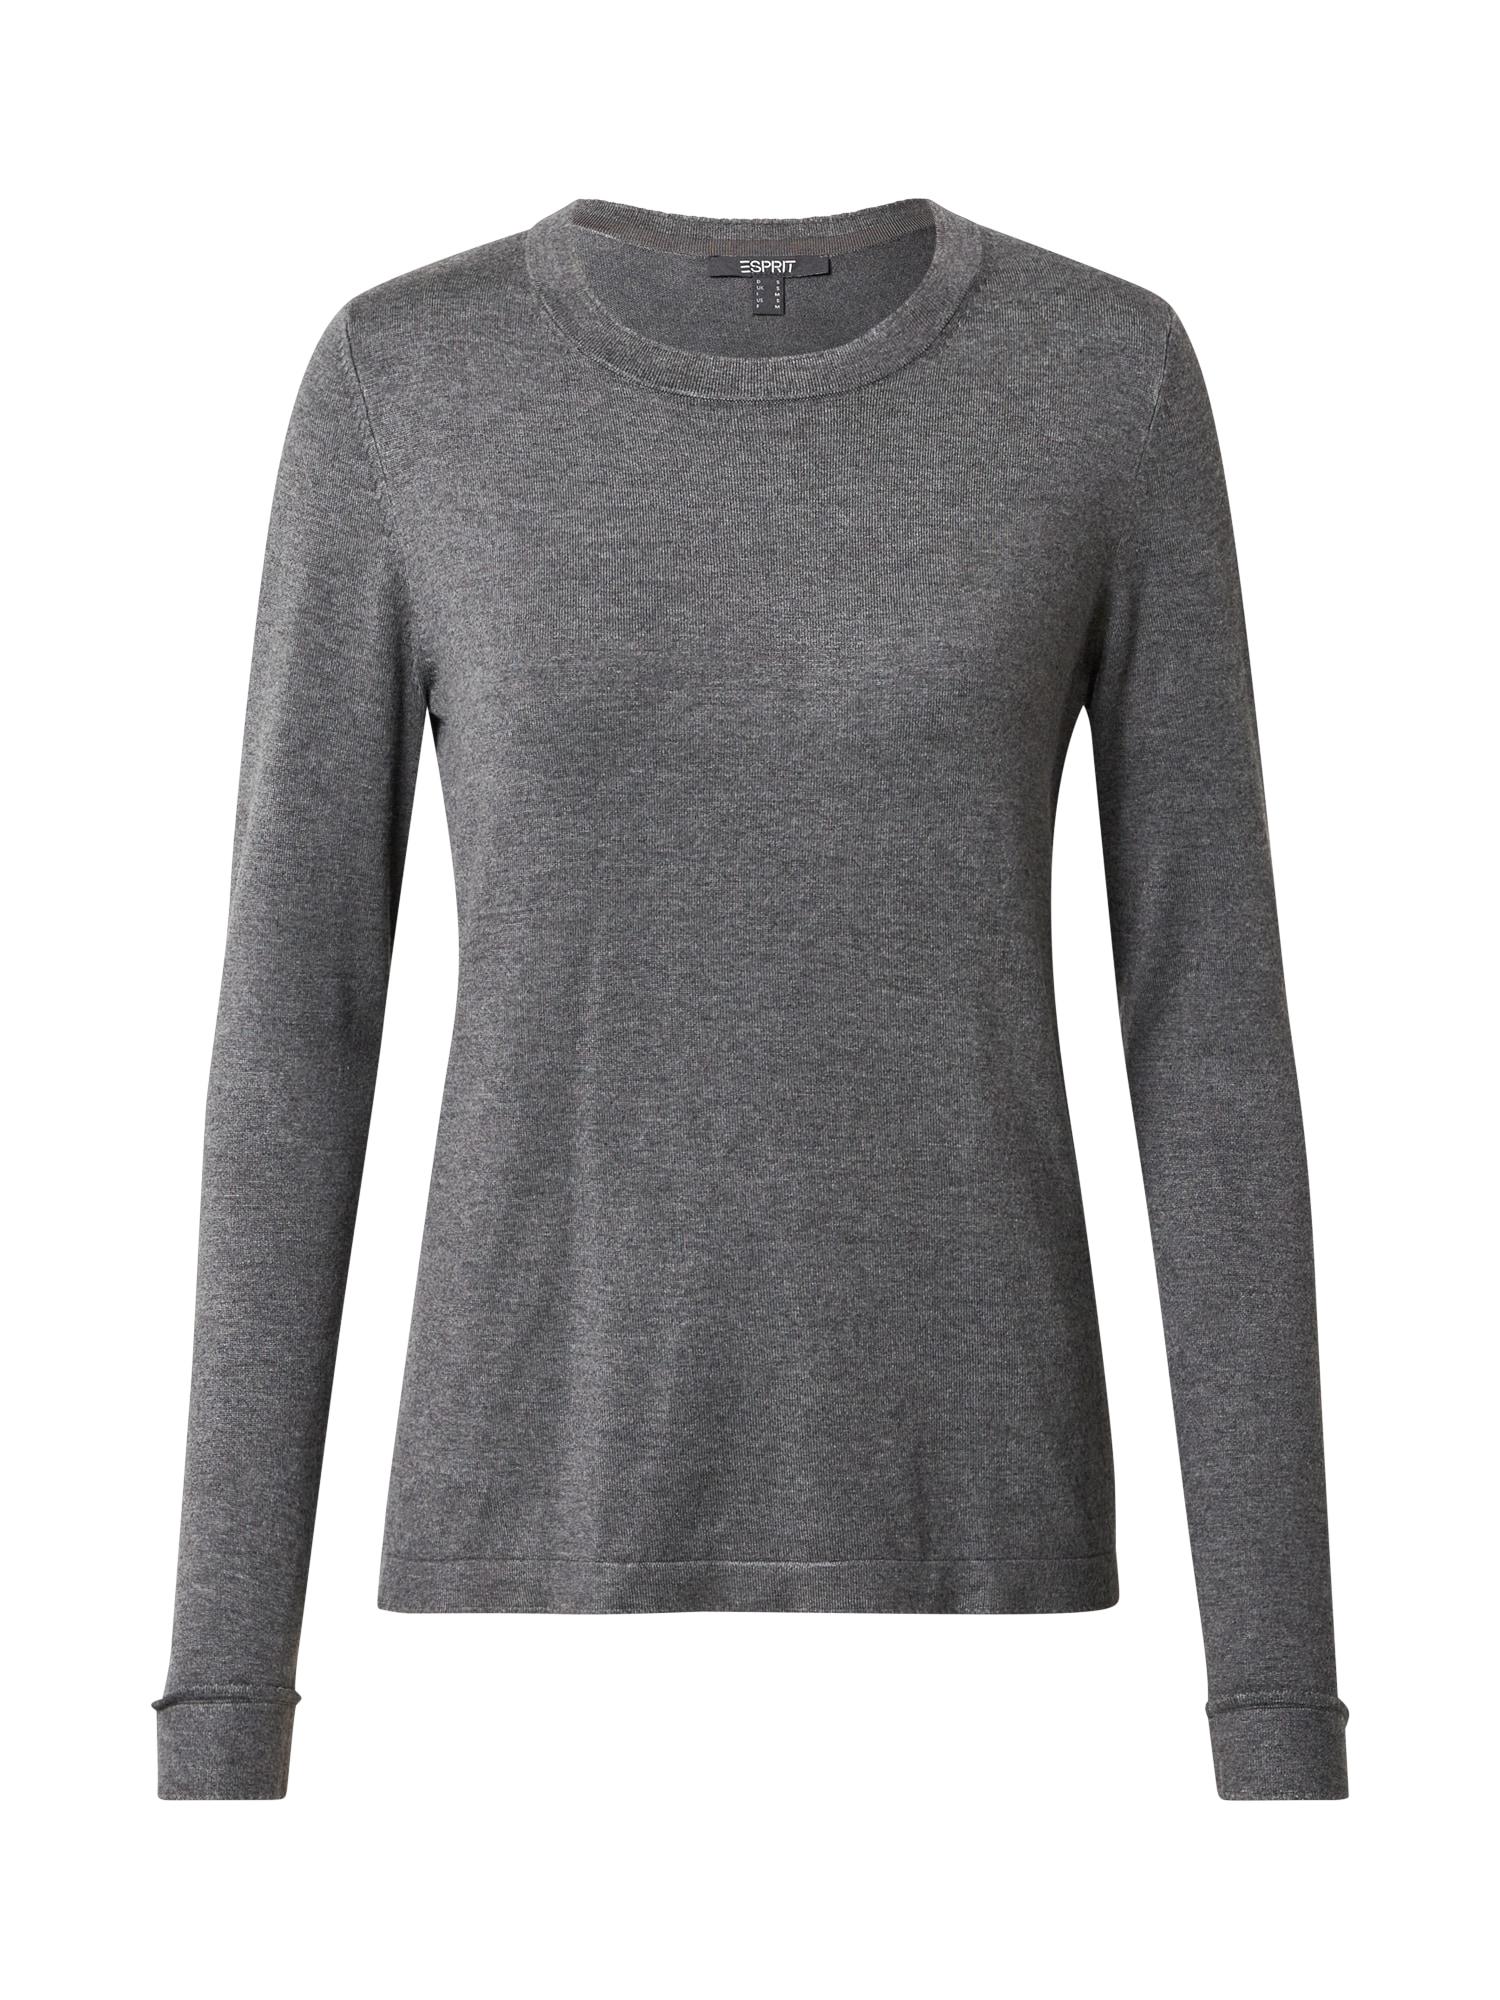 Esprit Collection Megztinis margai pilka